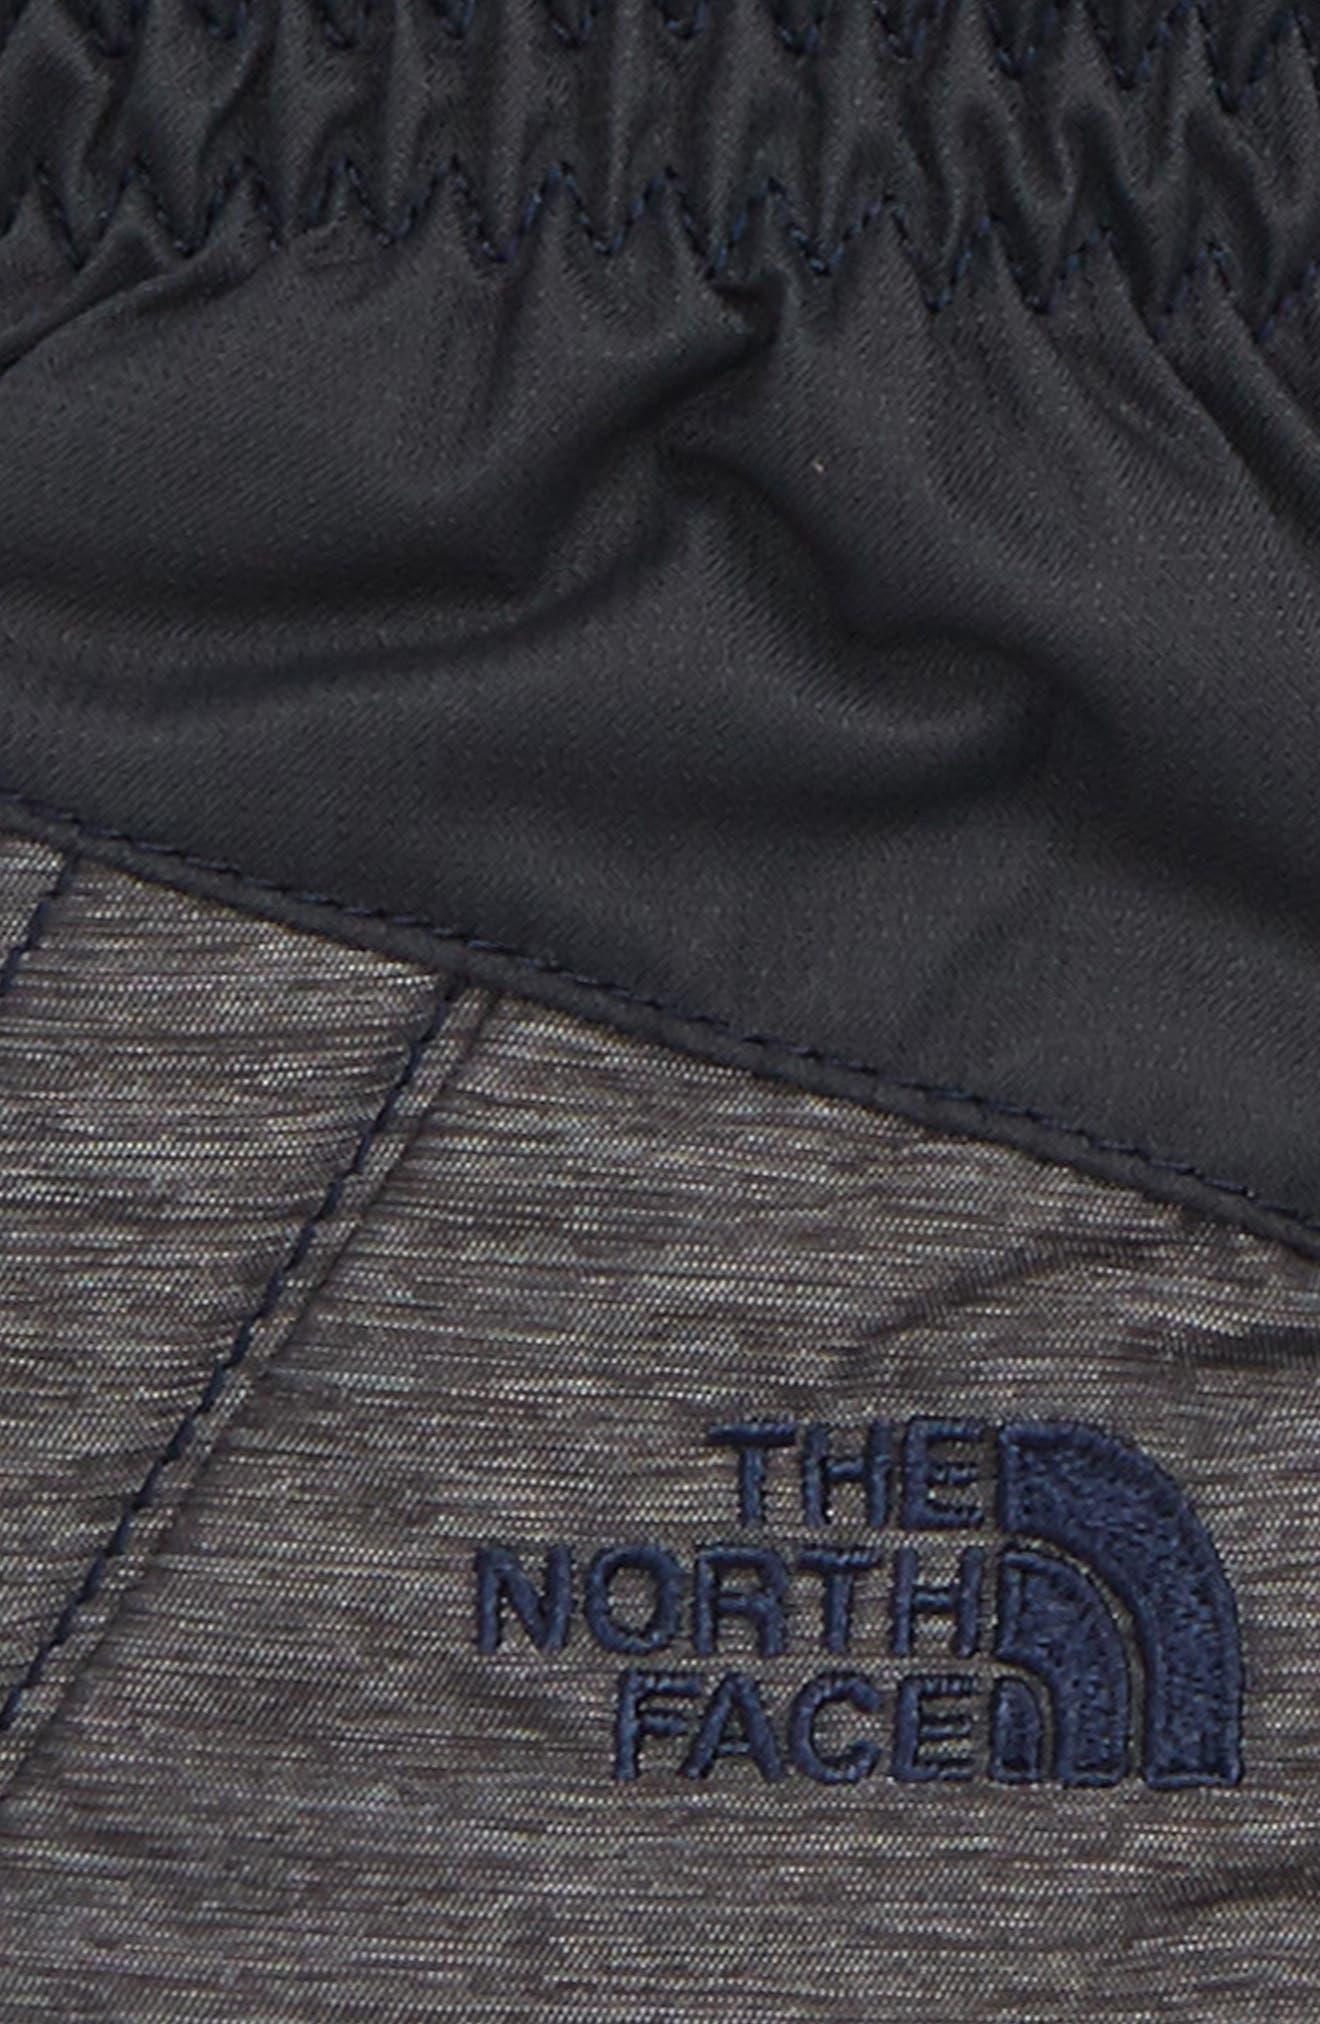 Montana Gore-Tex<sup>®</sup> Waterproof Gloves,                             Alternate thumbnail 3, color,                             Graphite Grey/ Cosmic Blue